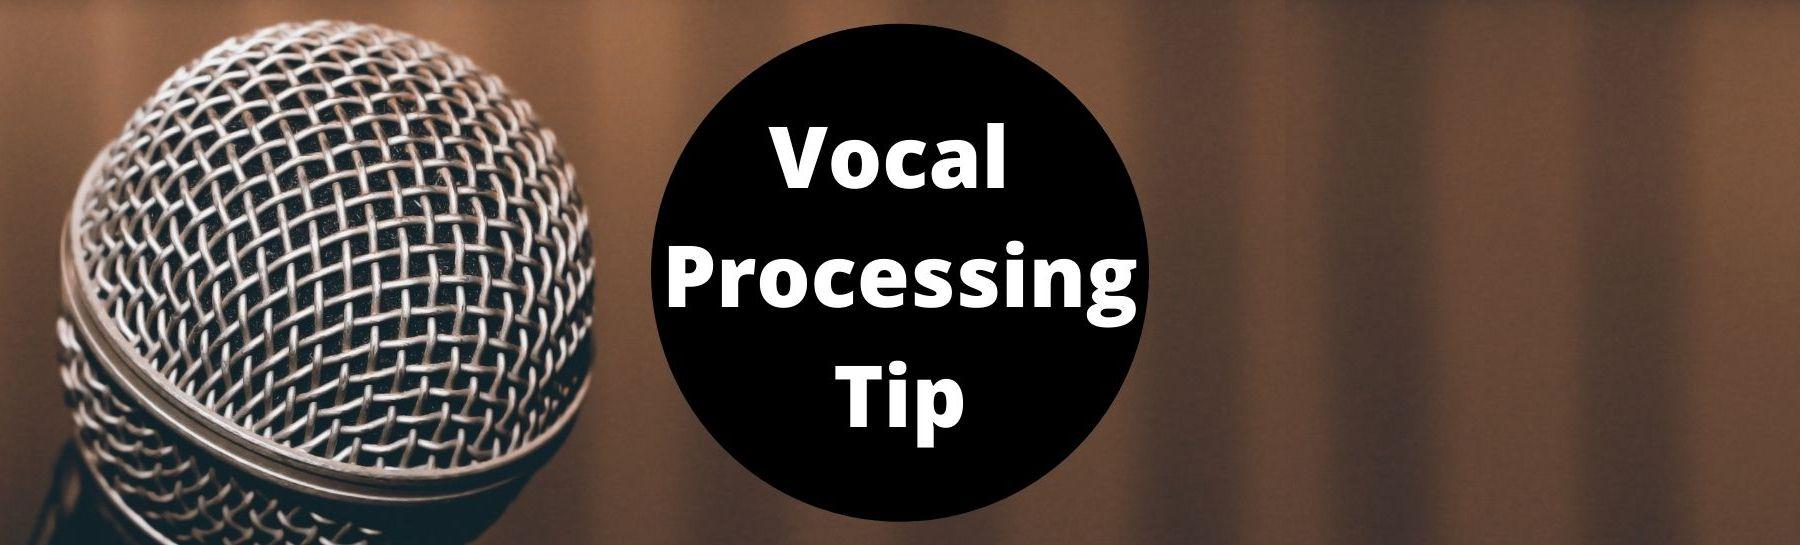 vocal processing tip